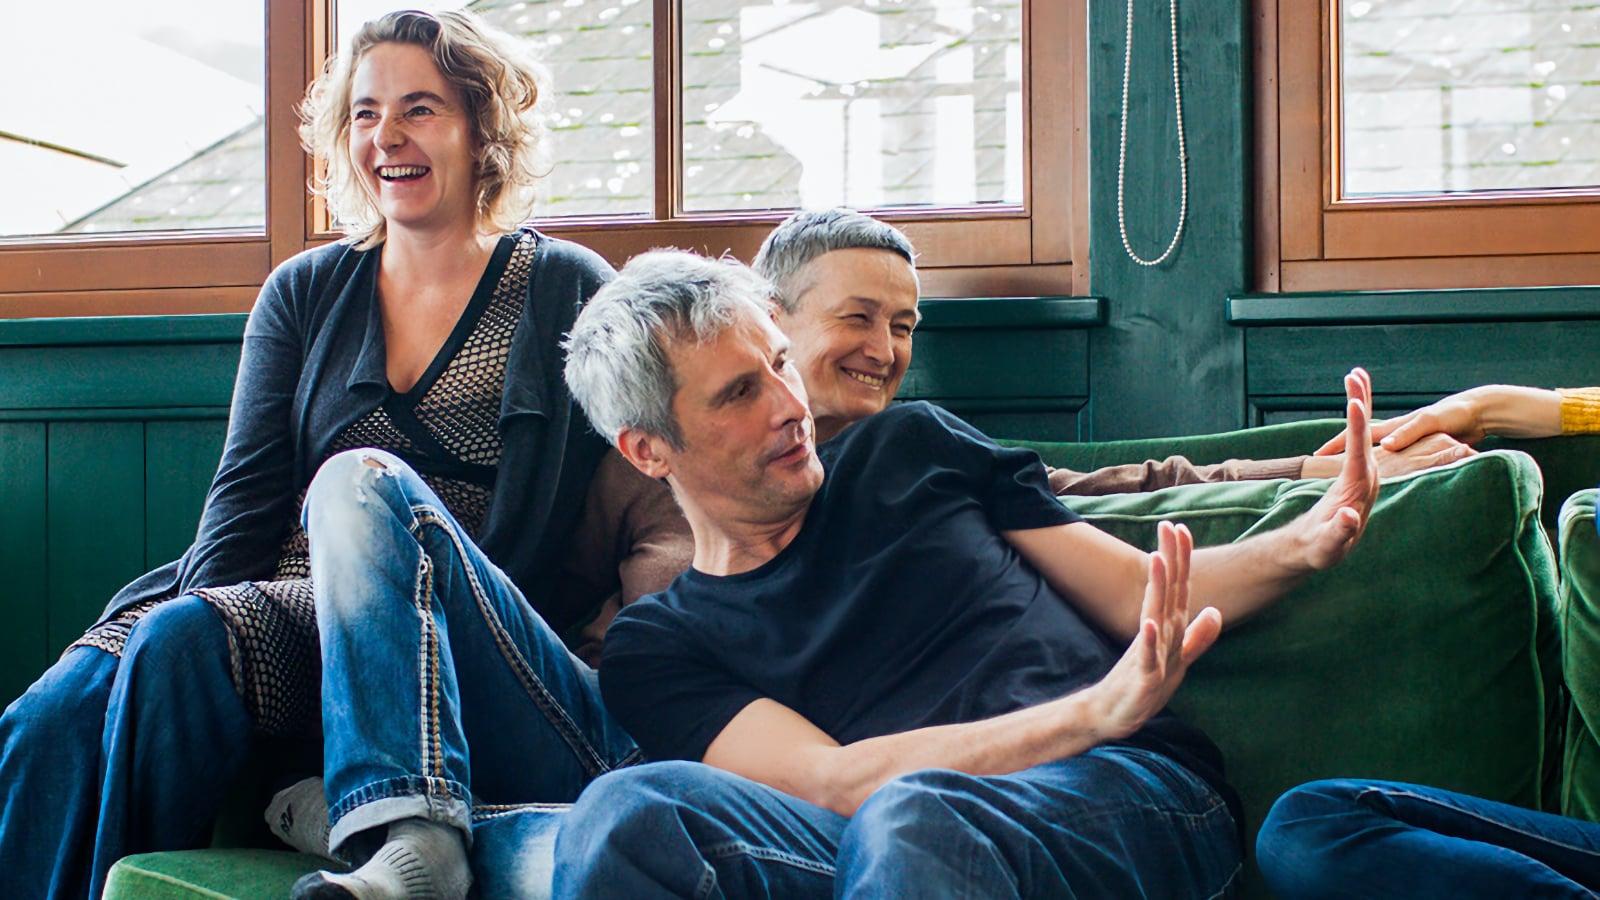 Sabine Parzer and Malcolm Manning Austria Contact Improvisation Festival 2016. Photo by Olga Berdikyan